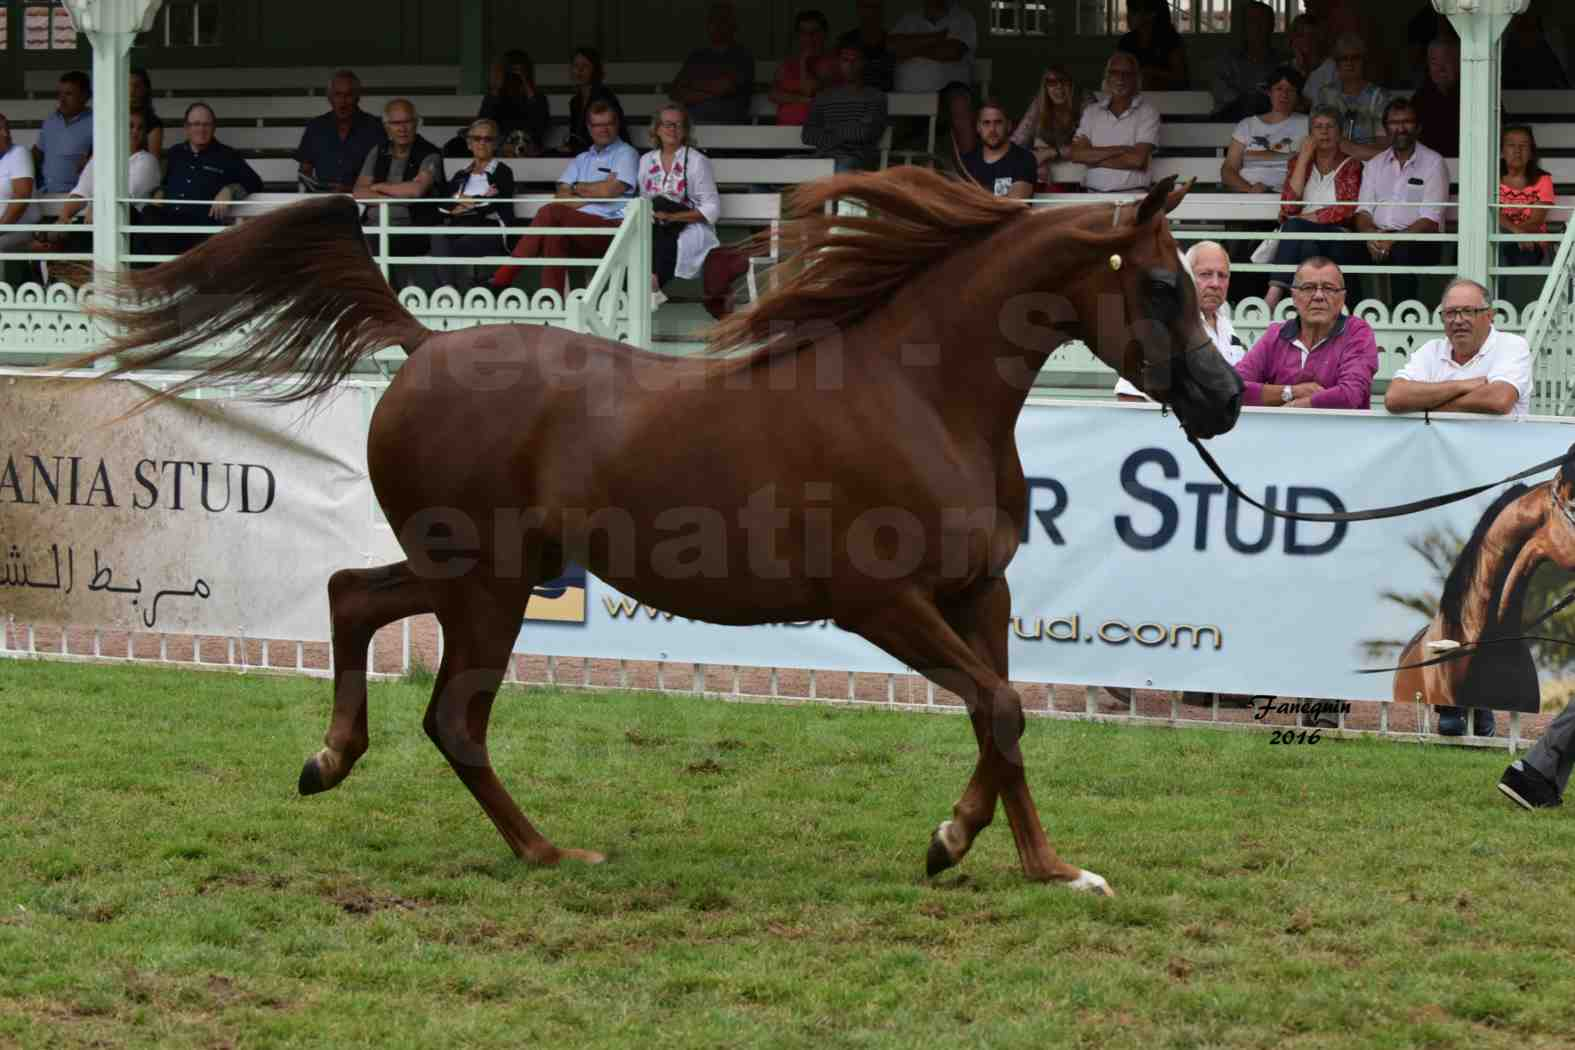 International Arabian Horse Show B de VICHY 2016 - PEARL DE DJOON - Notre Sélection - 06